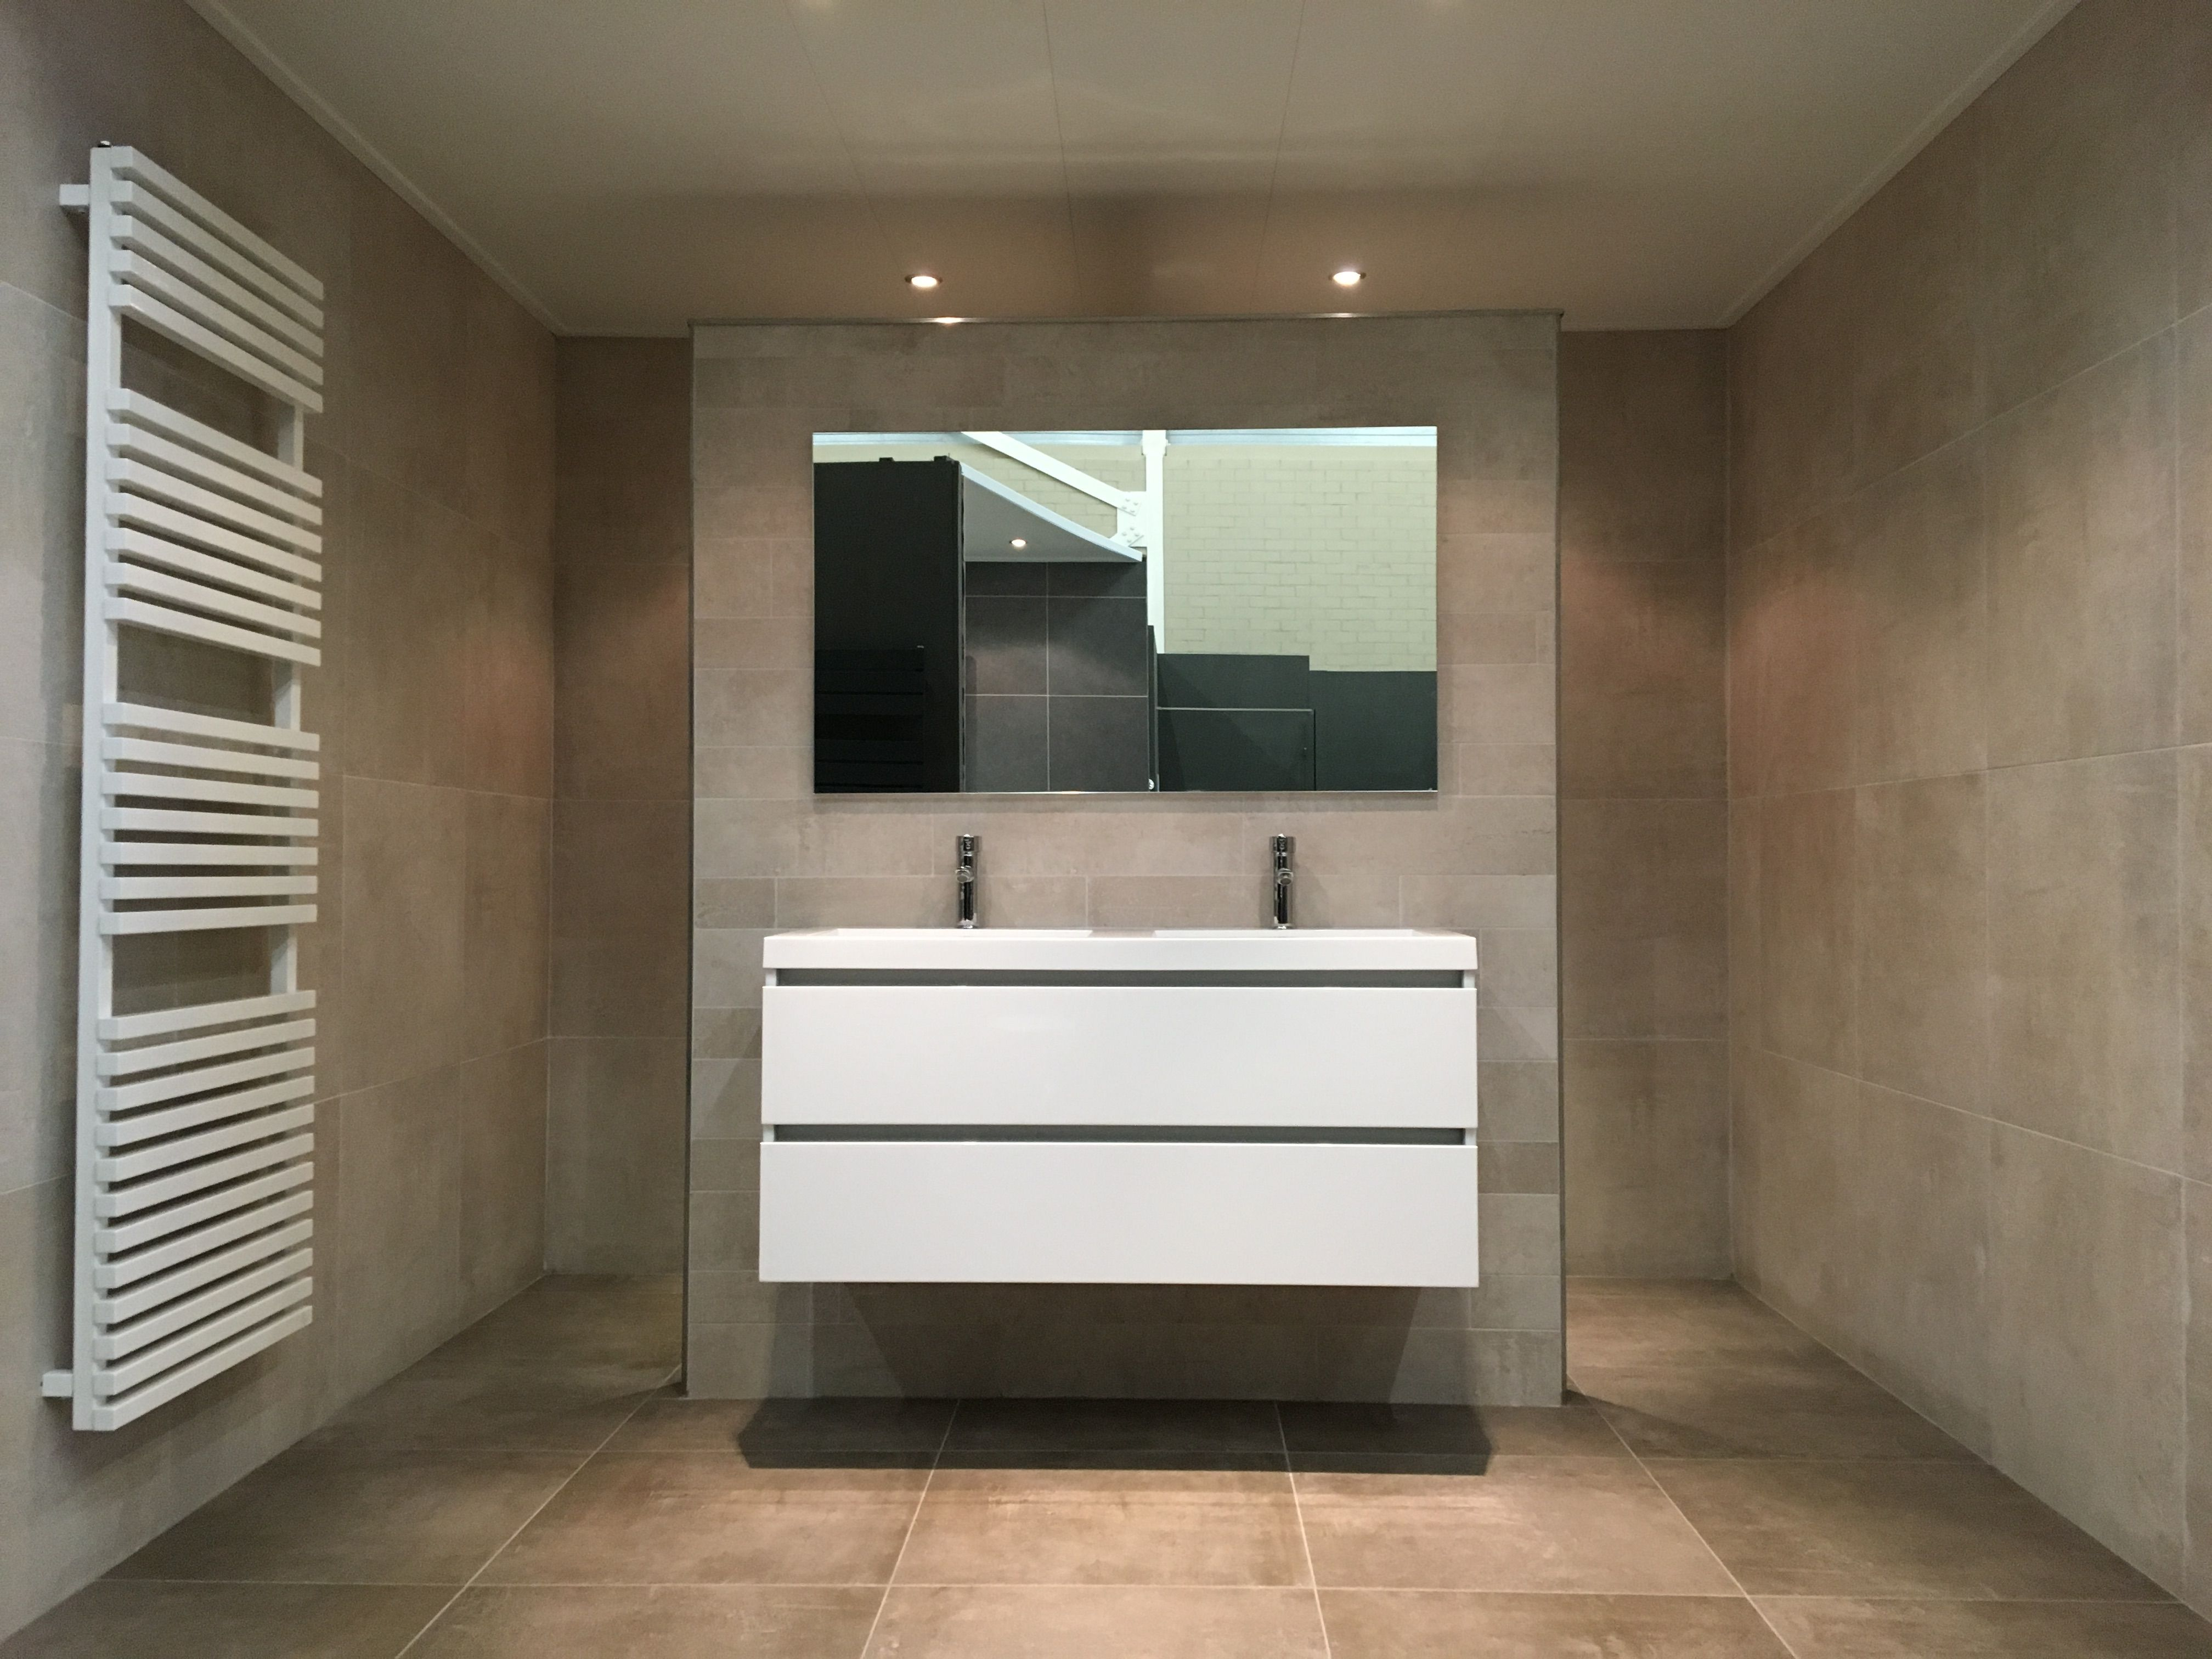 Badkamer Trends Tegels : Complete badkamer trend incl tegels badkamer